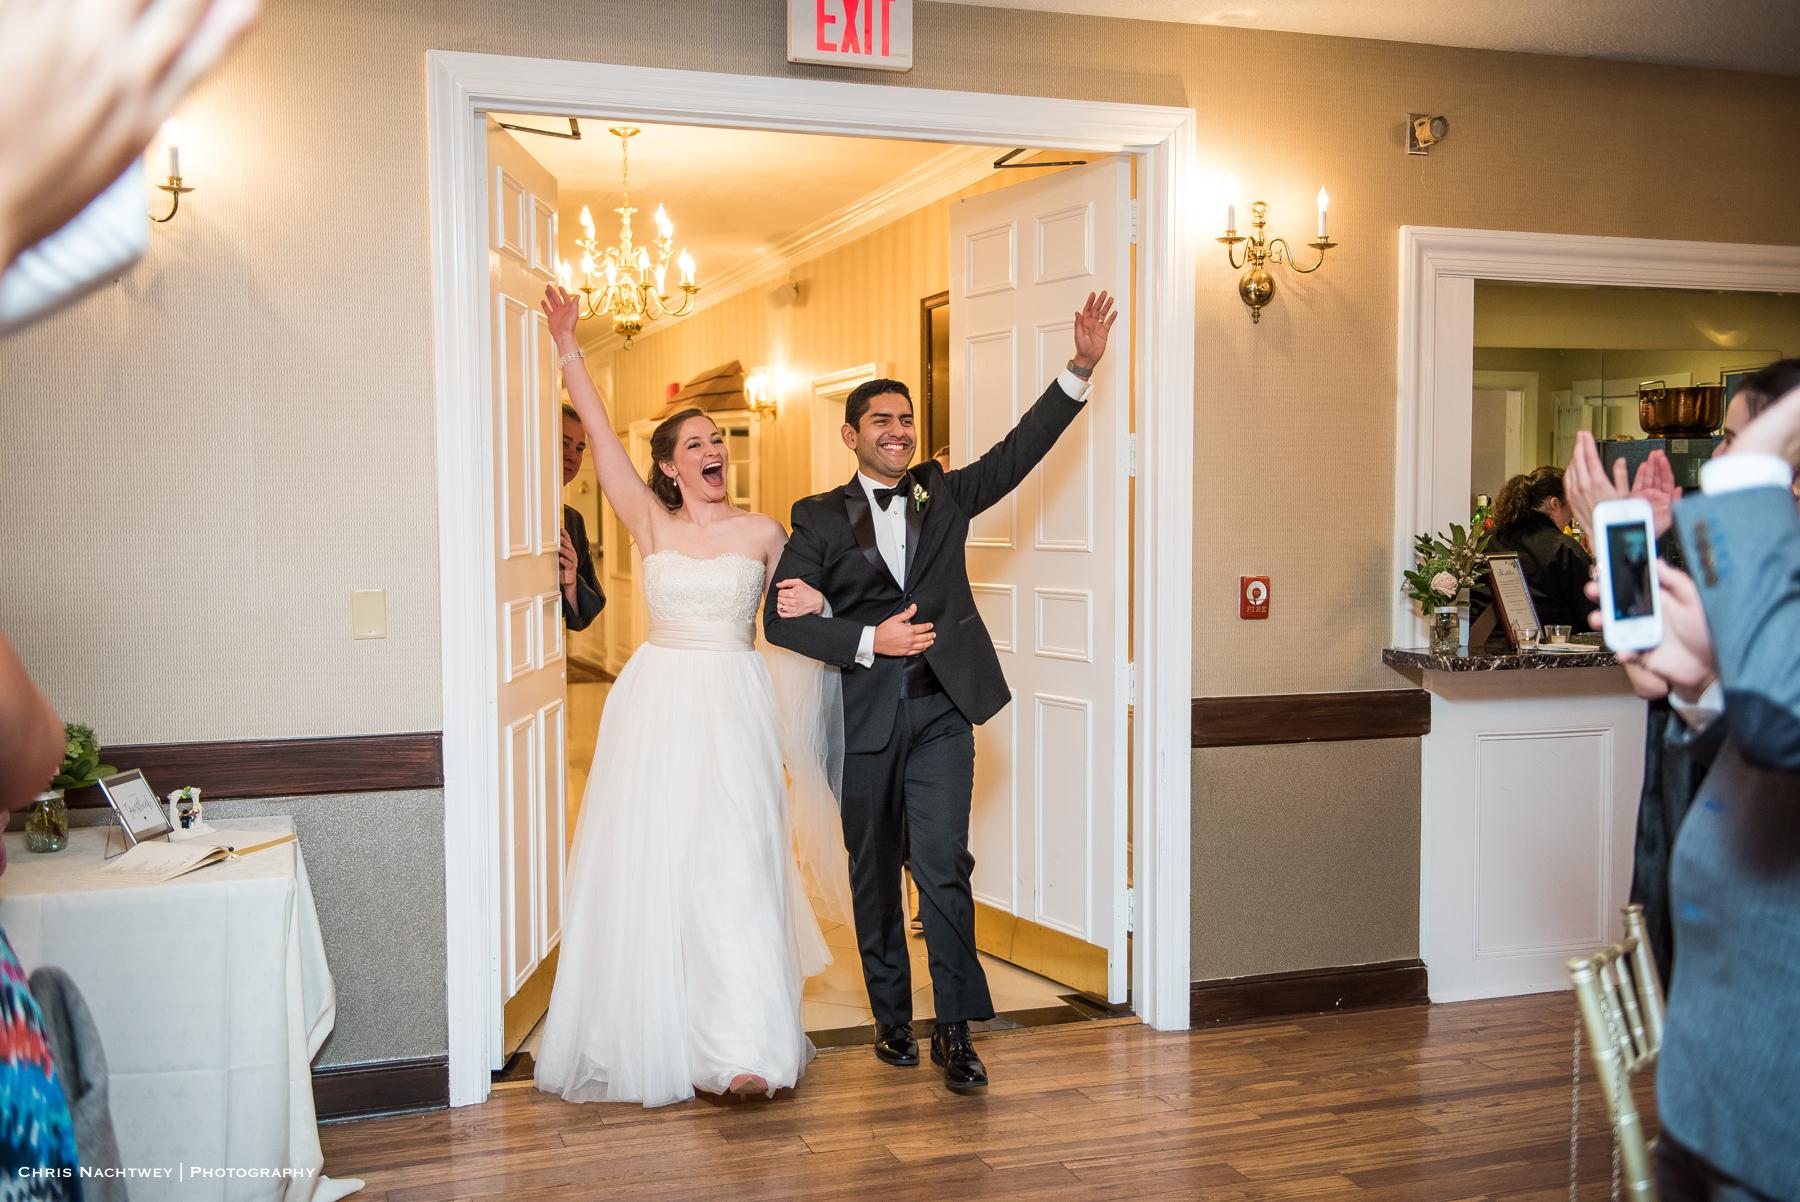 wedding-the-litchfield-inn-ct-photos-chris-nachtwey-photography-2018-46.jpg